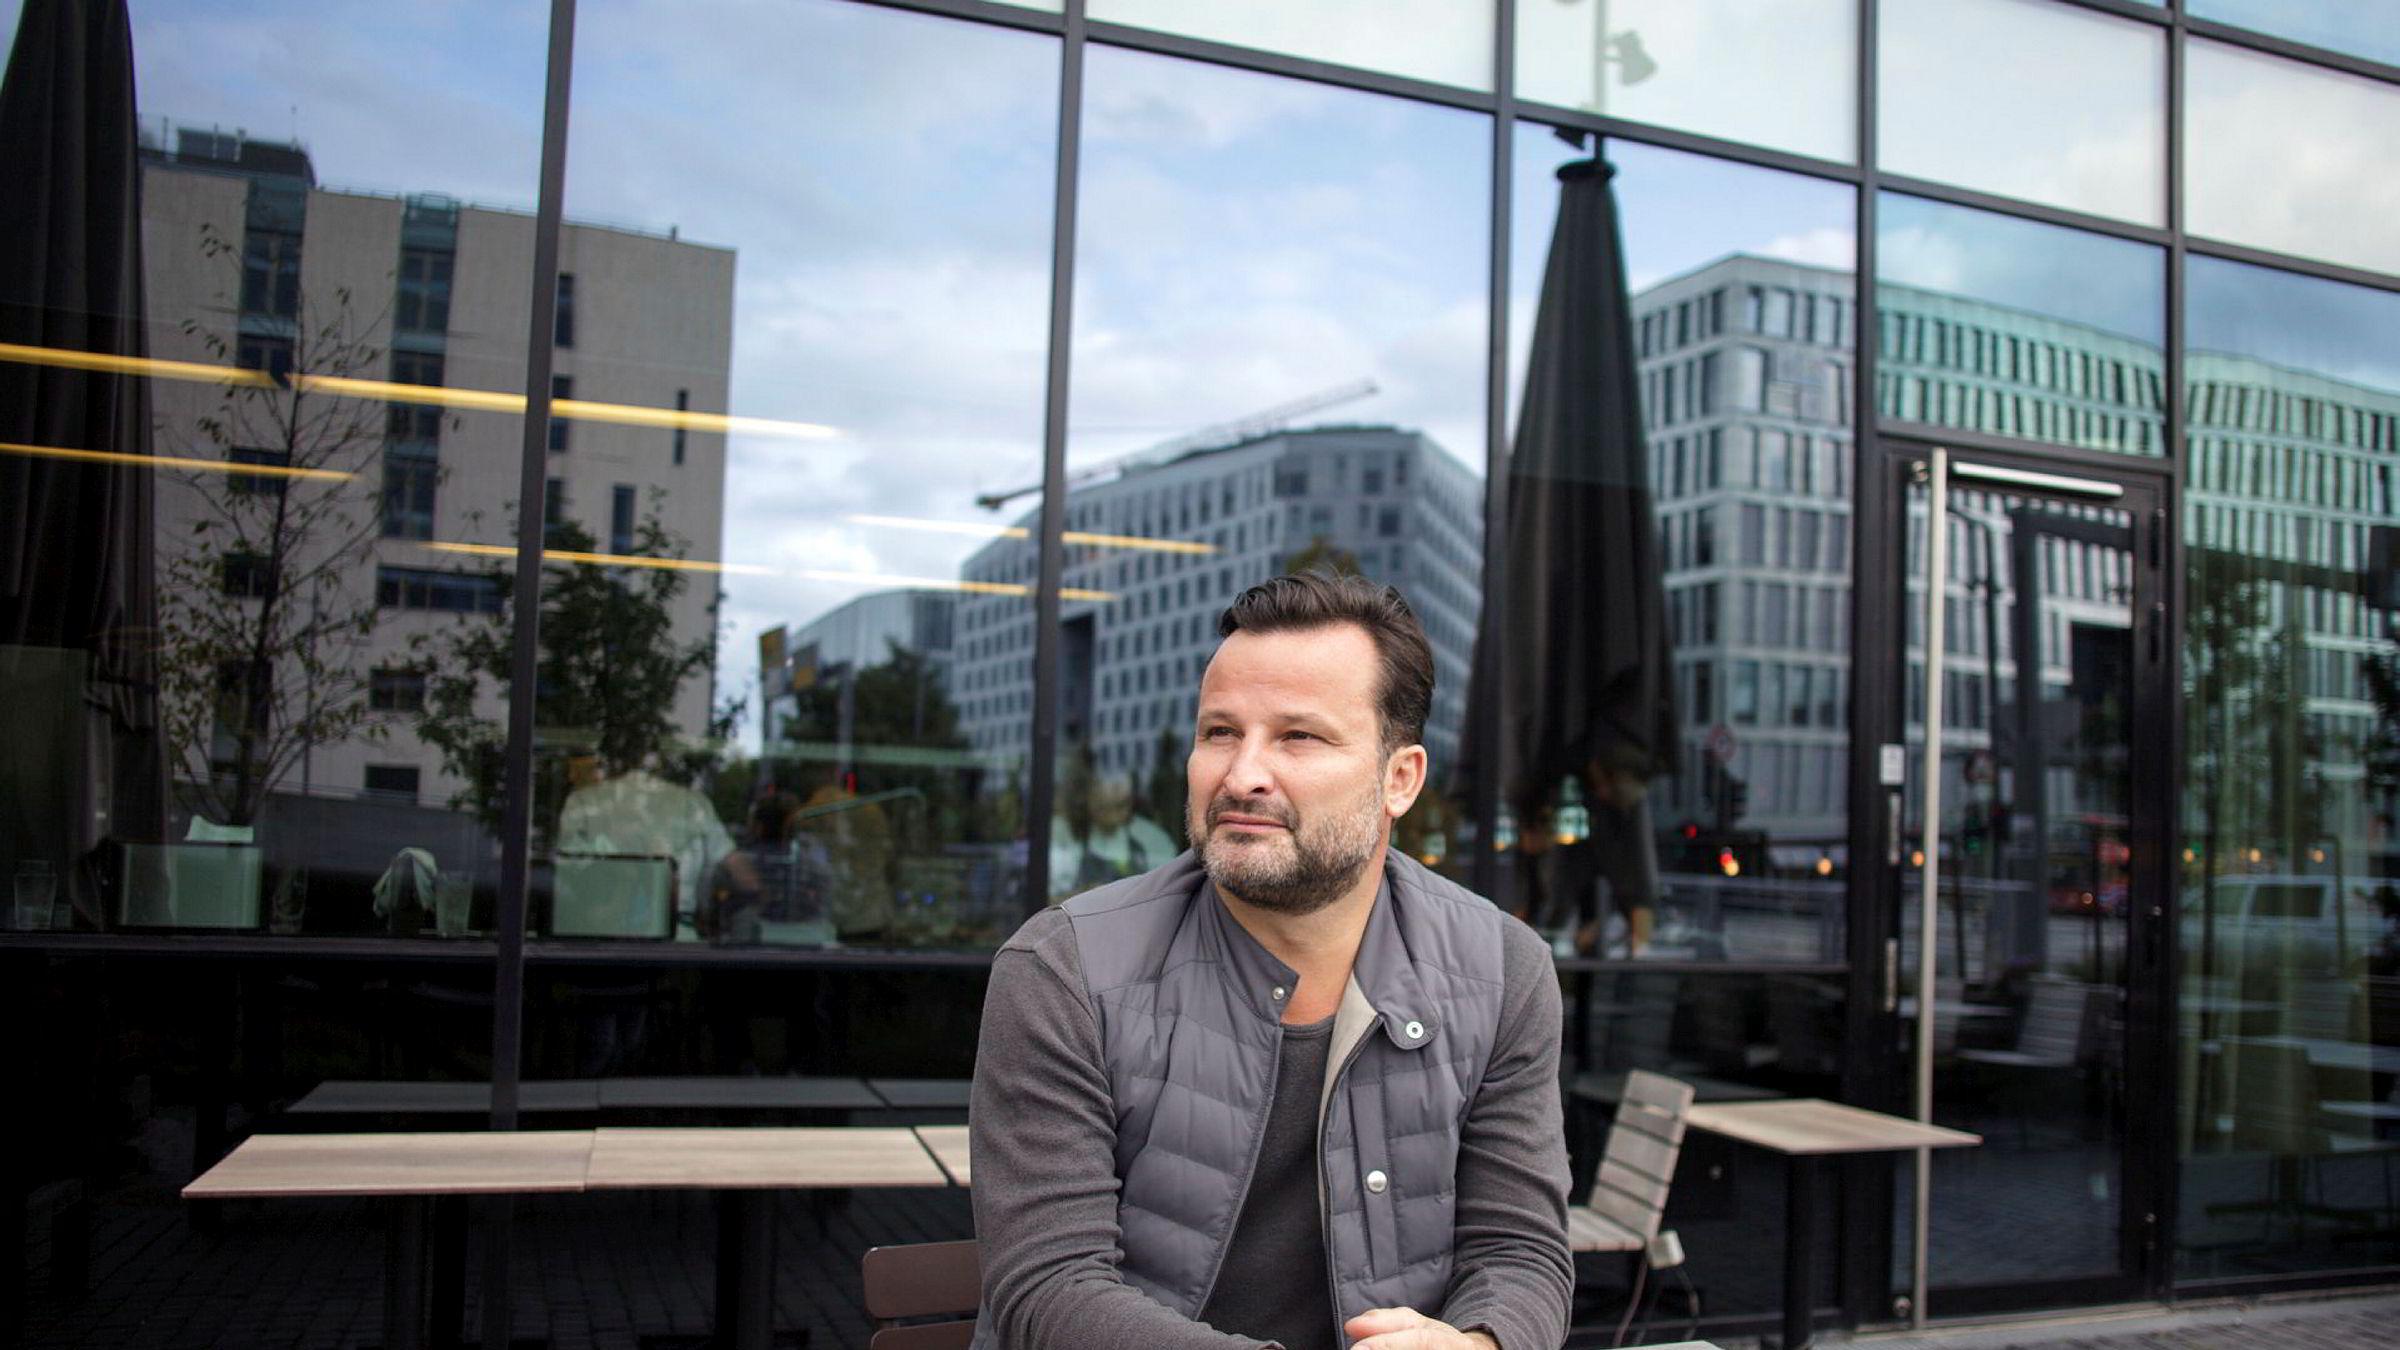 Tapad-gründer Are Traasdahl er president i investeringsselskapet Spring Capital, og fast spaltist i Dagens Næringsliv.